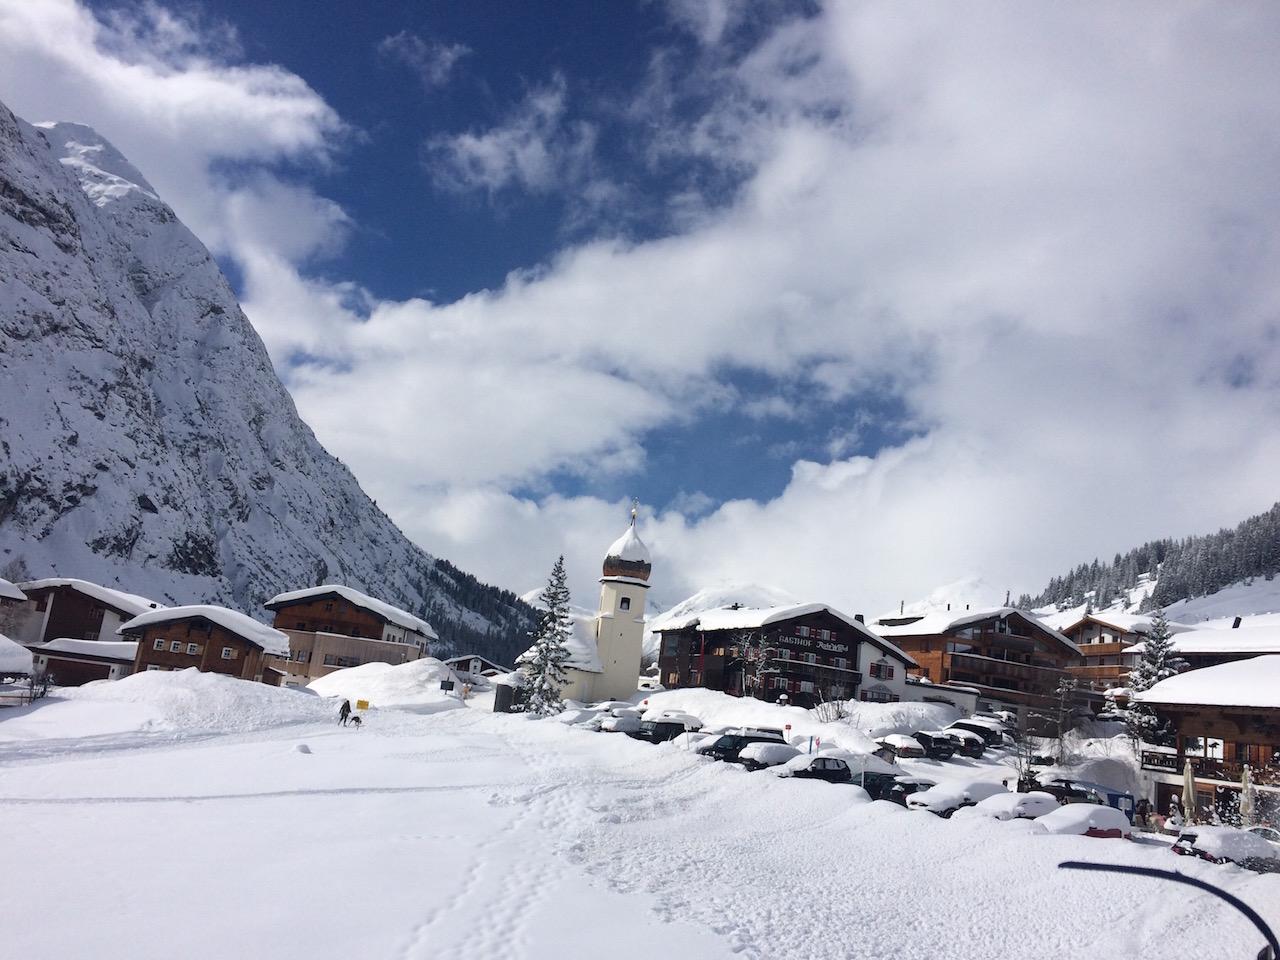 Zug am Arlberg